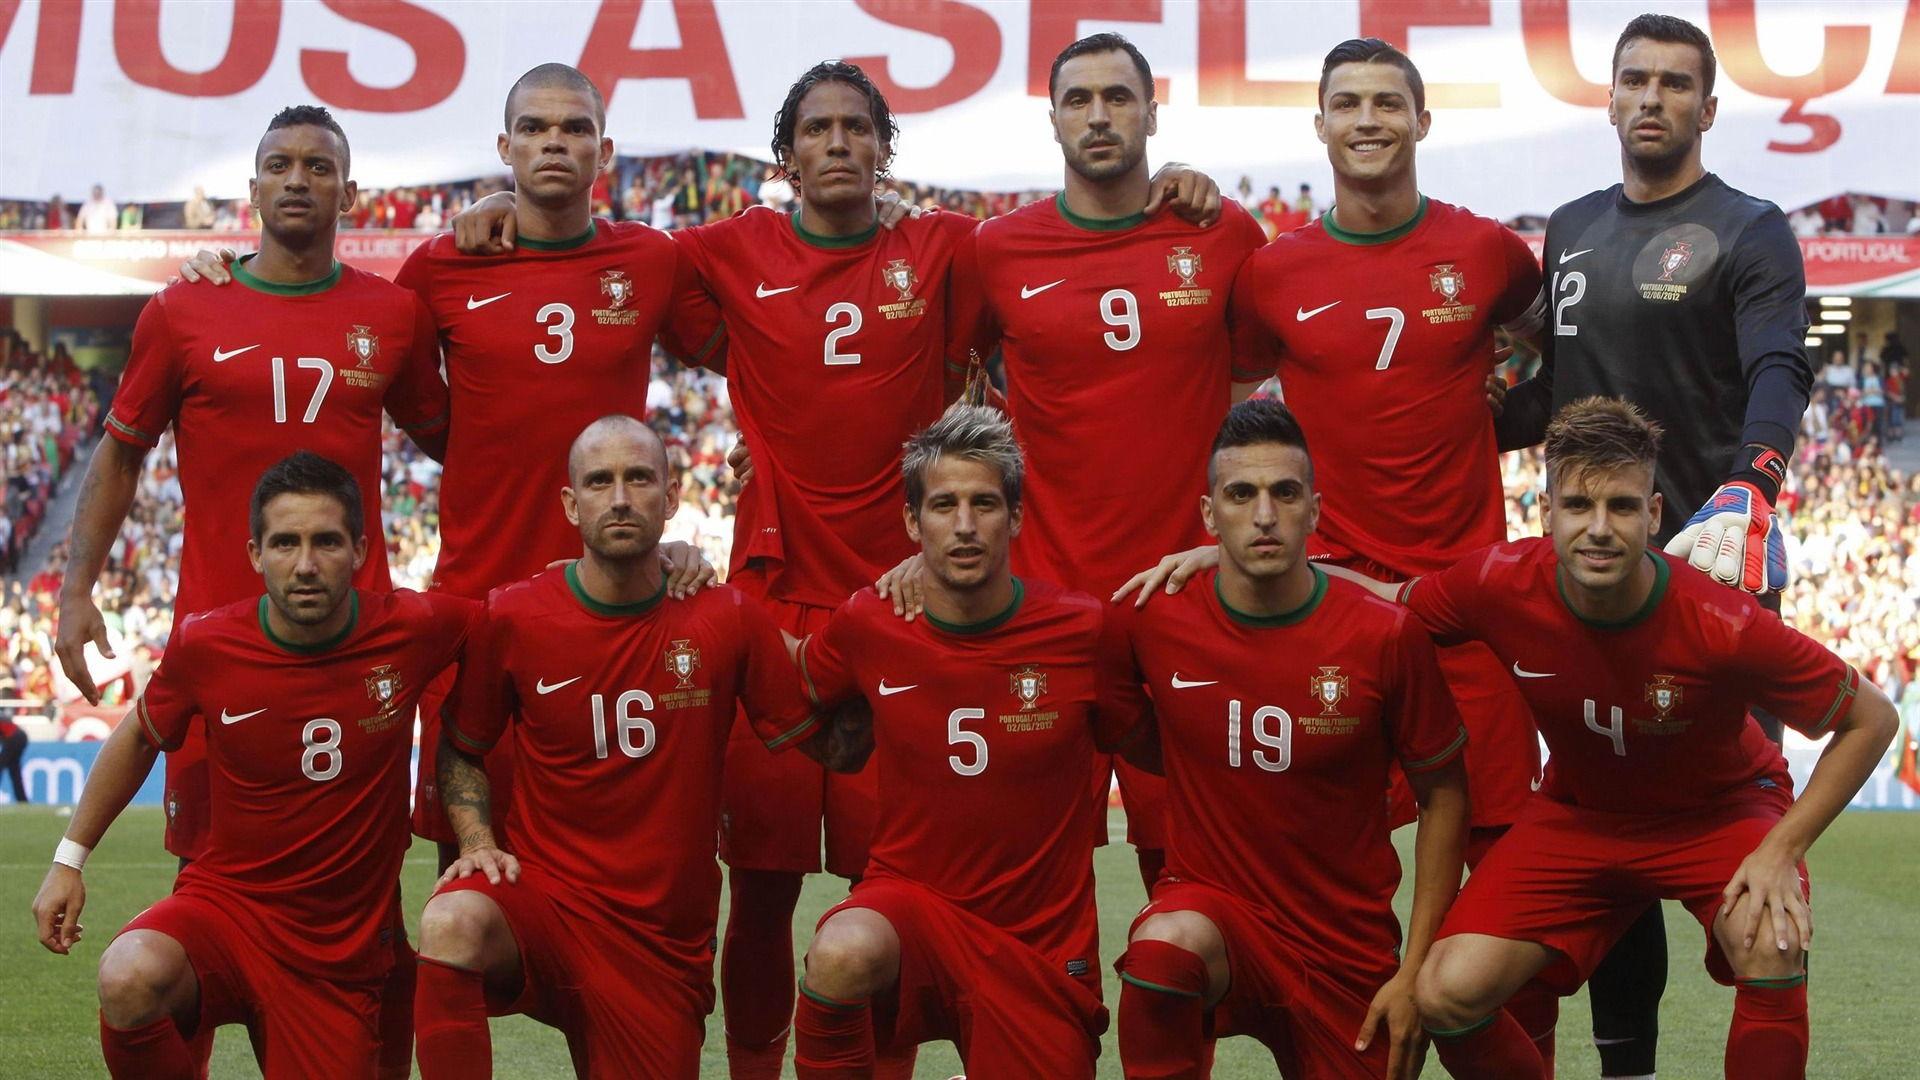 14 Portugal Football Team Wallpapers 538 Portugal 1920x1080